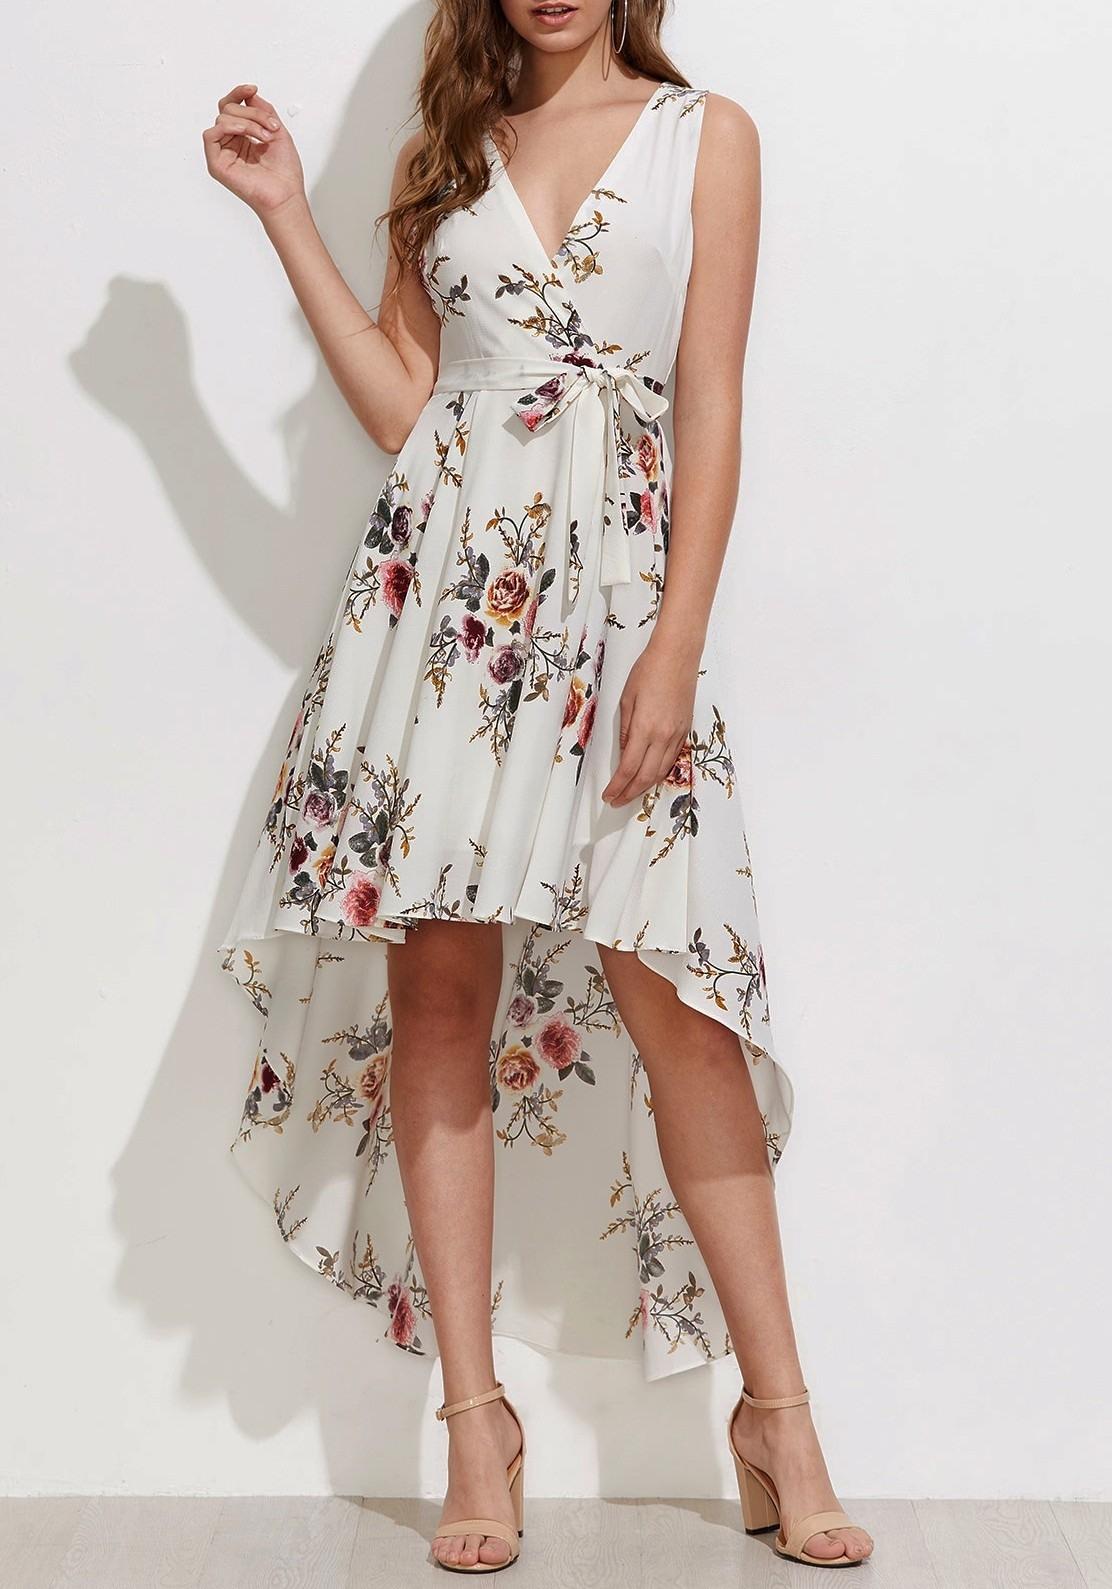 Genial Kleid Mit Blumenprint Stylish20 Kreativ Kleid Mit Blumenprint Ärmel